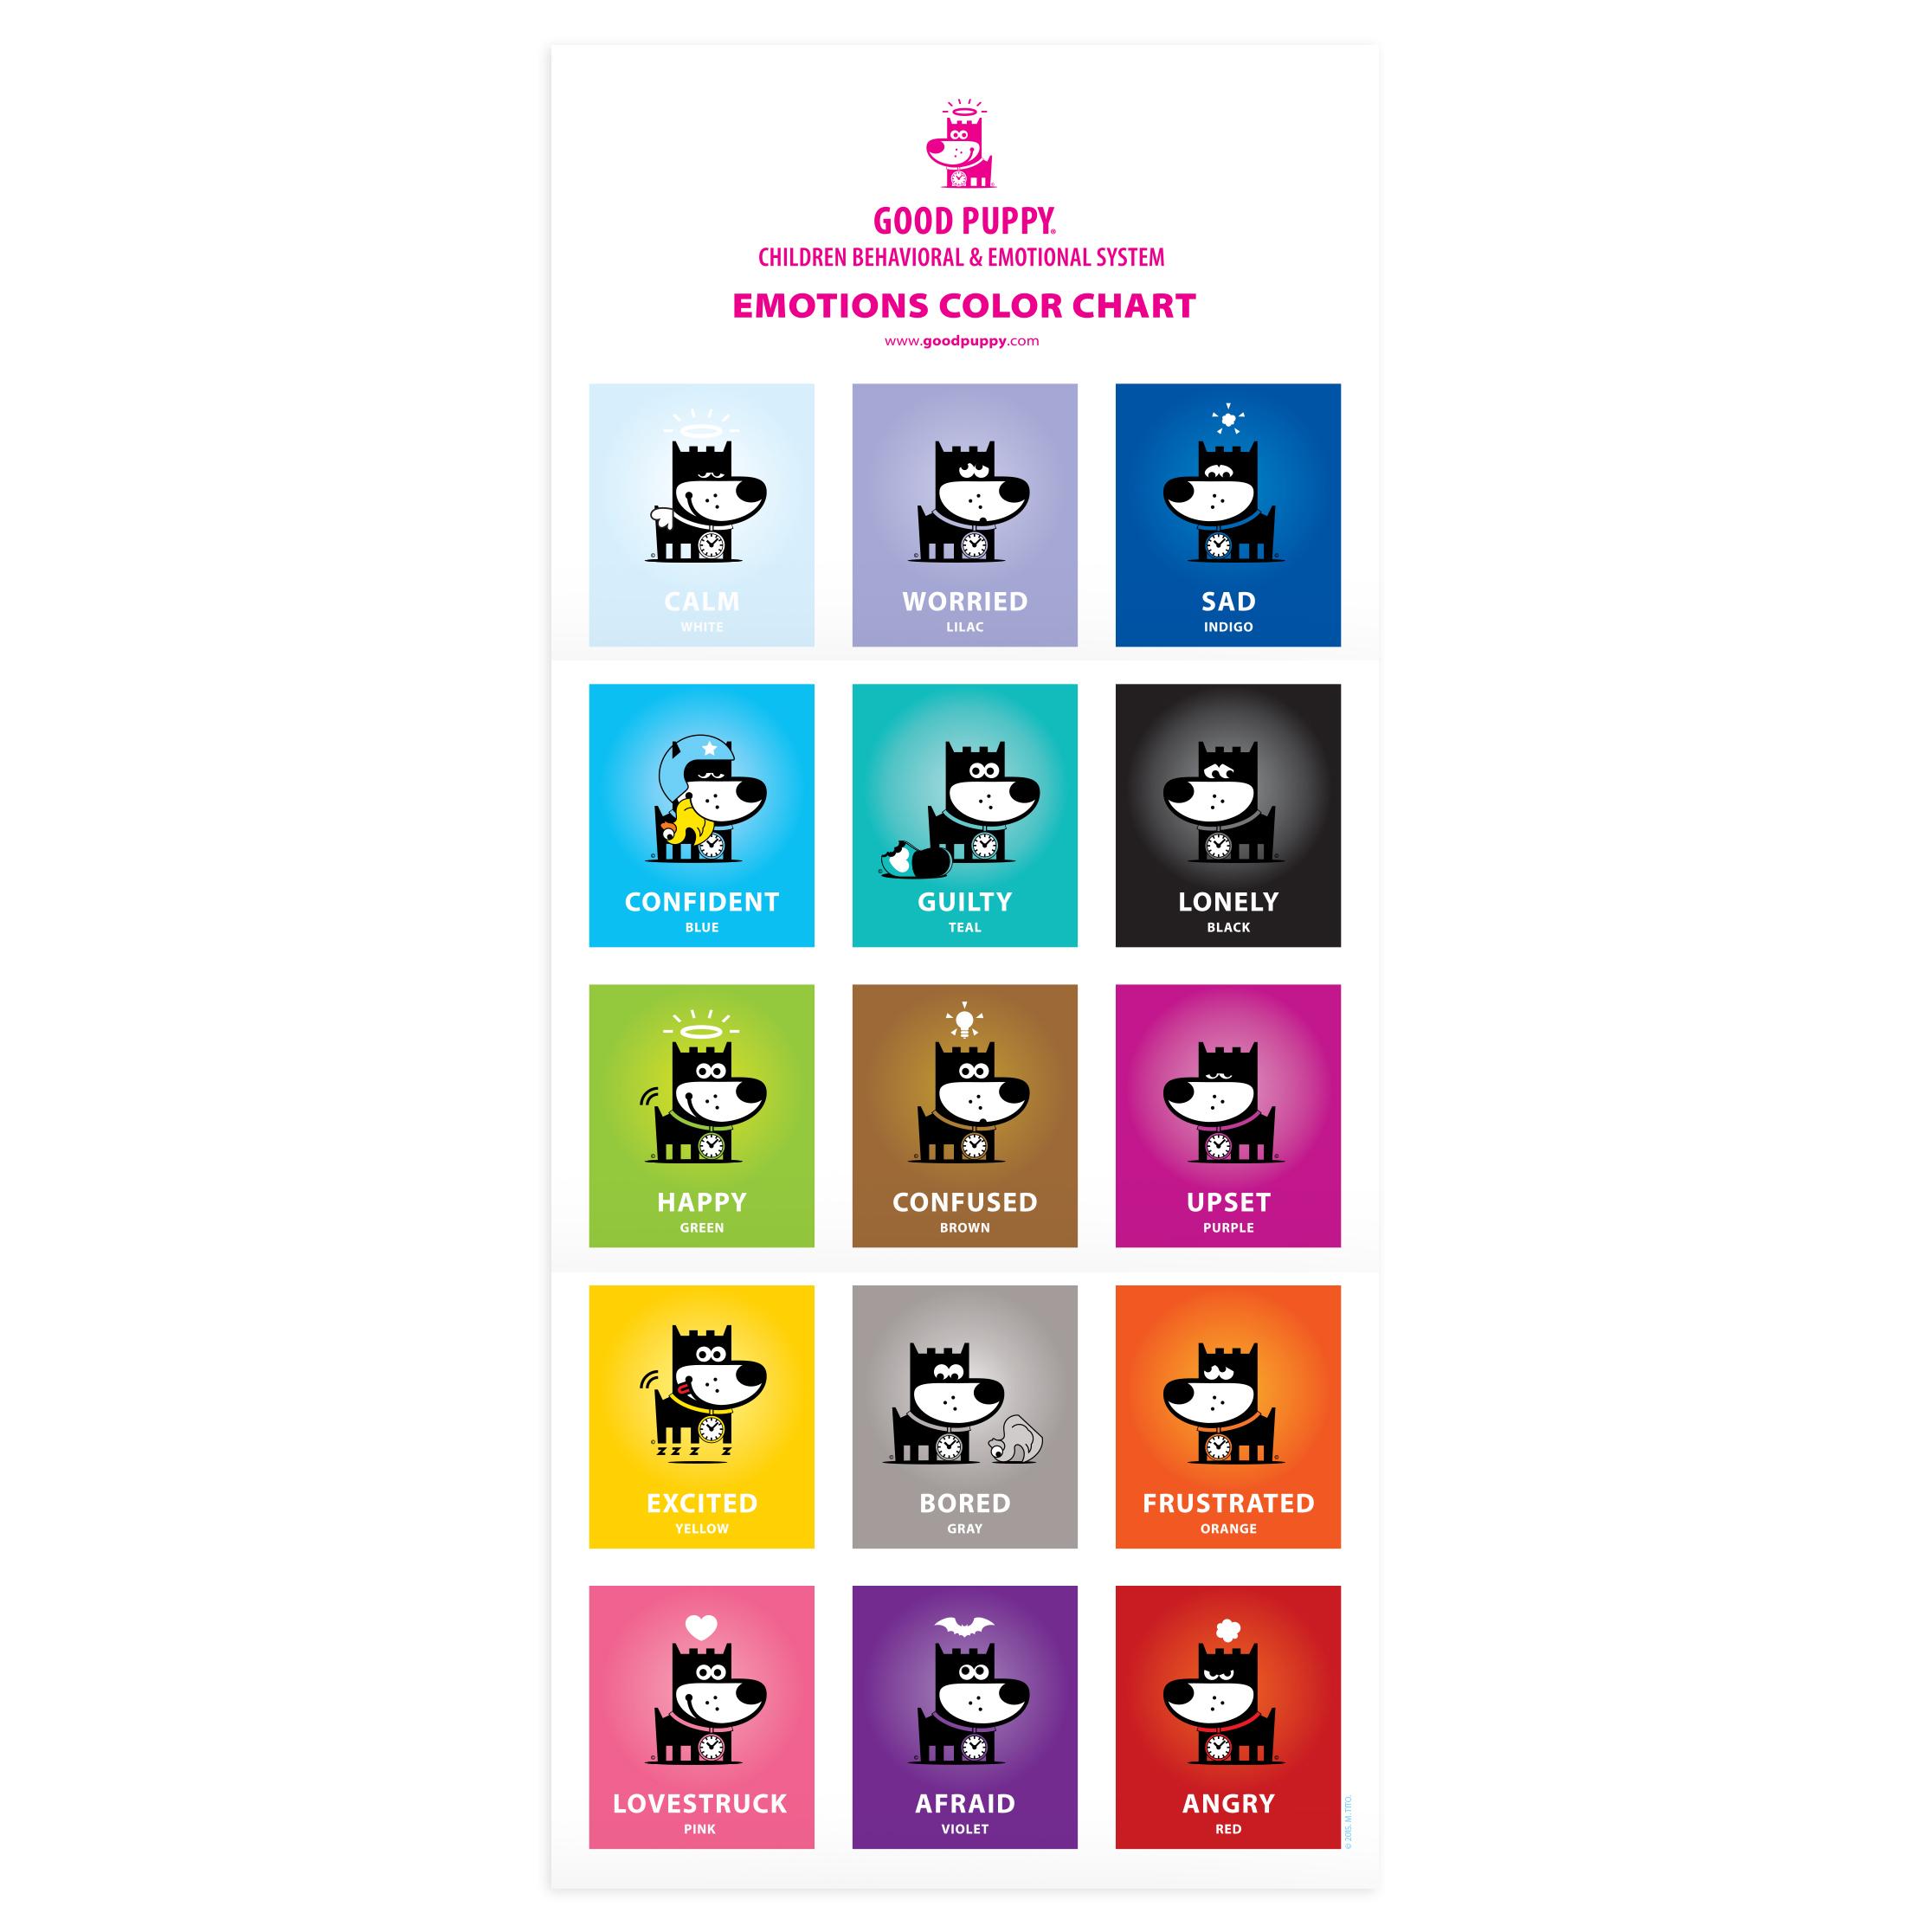 GP_Emotions_Color_Chart_01_Sqr.jpg